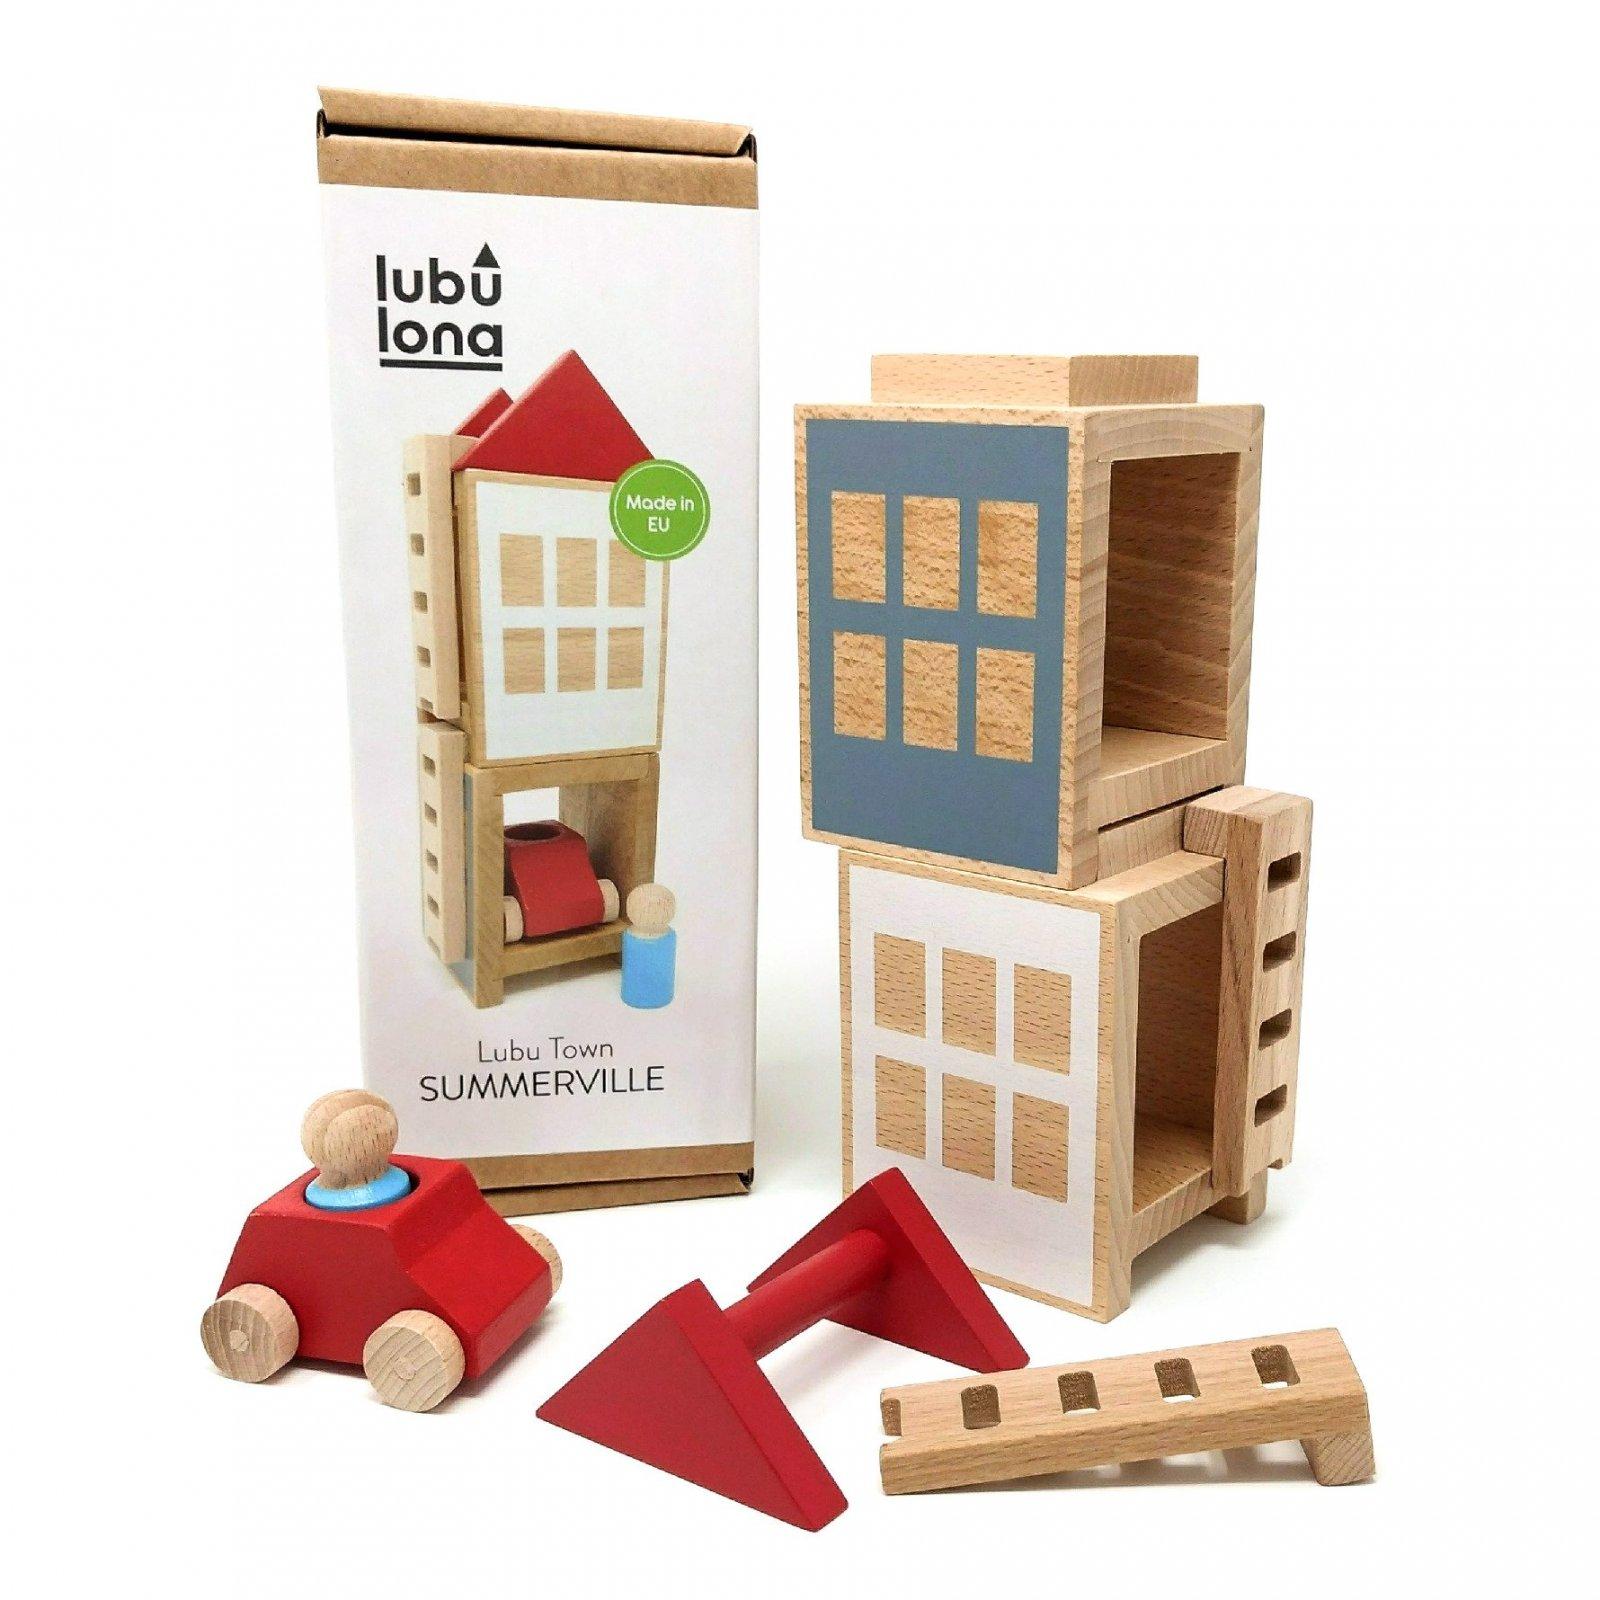 Lubu Town Mini Construction Set - Summerville by Lubulona